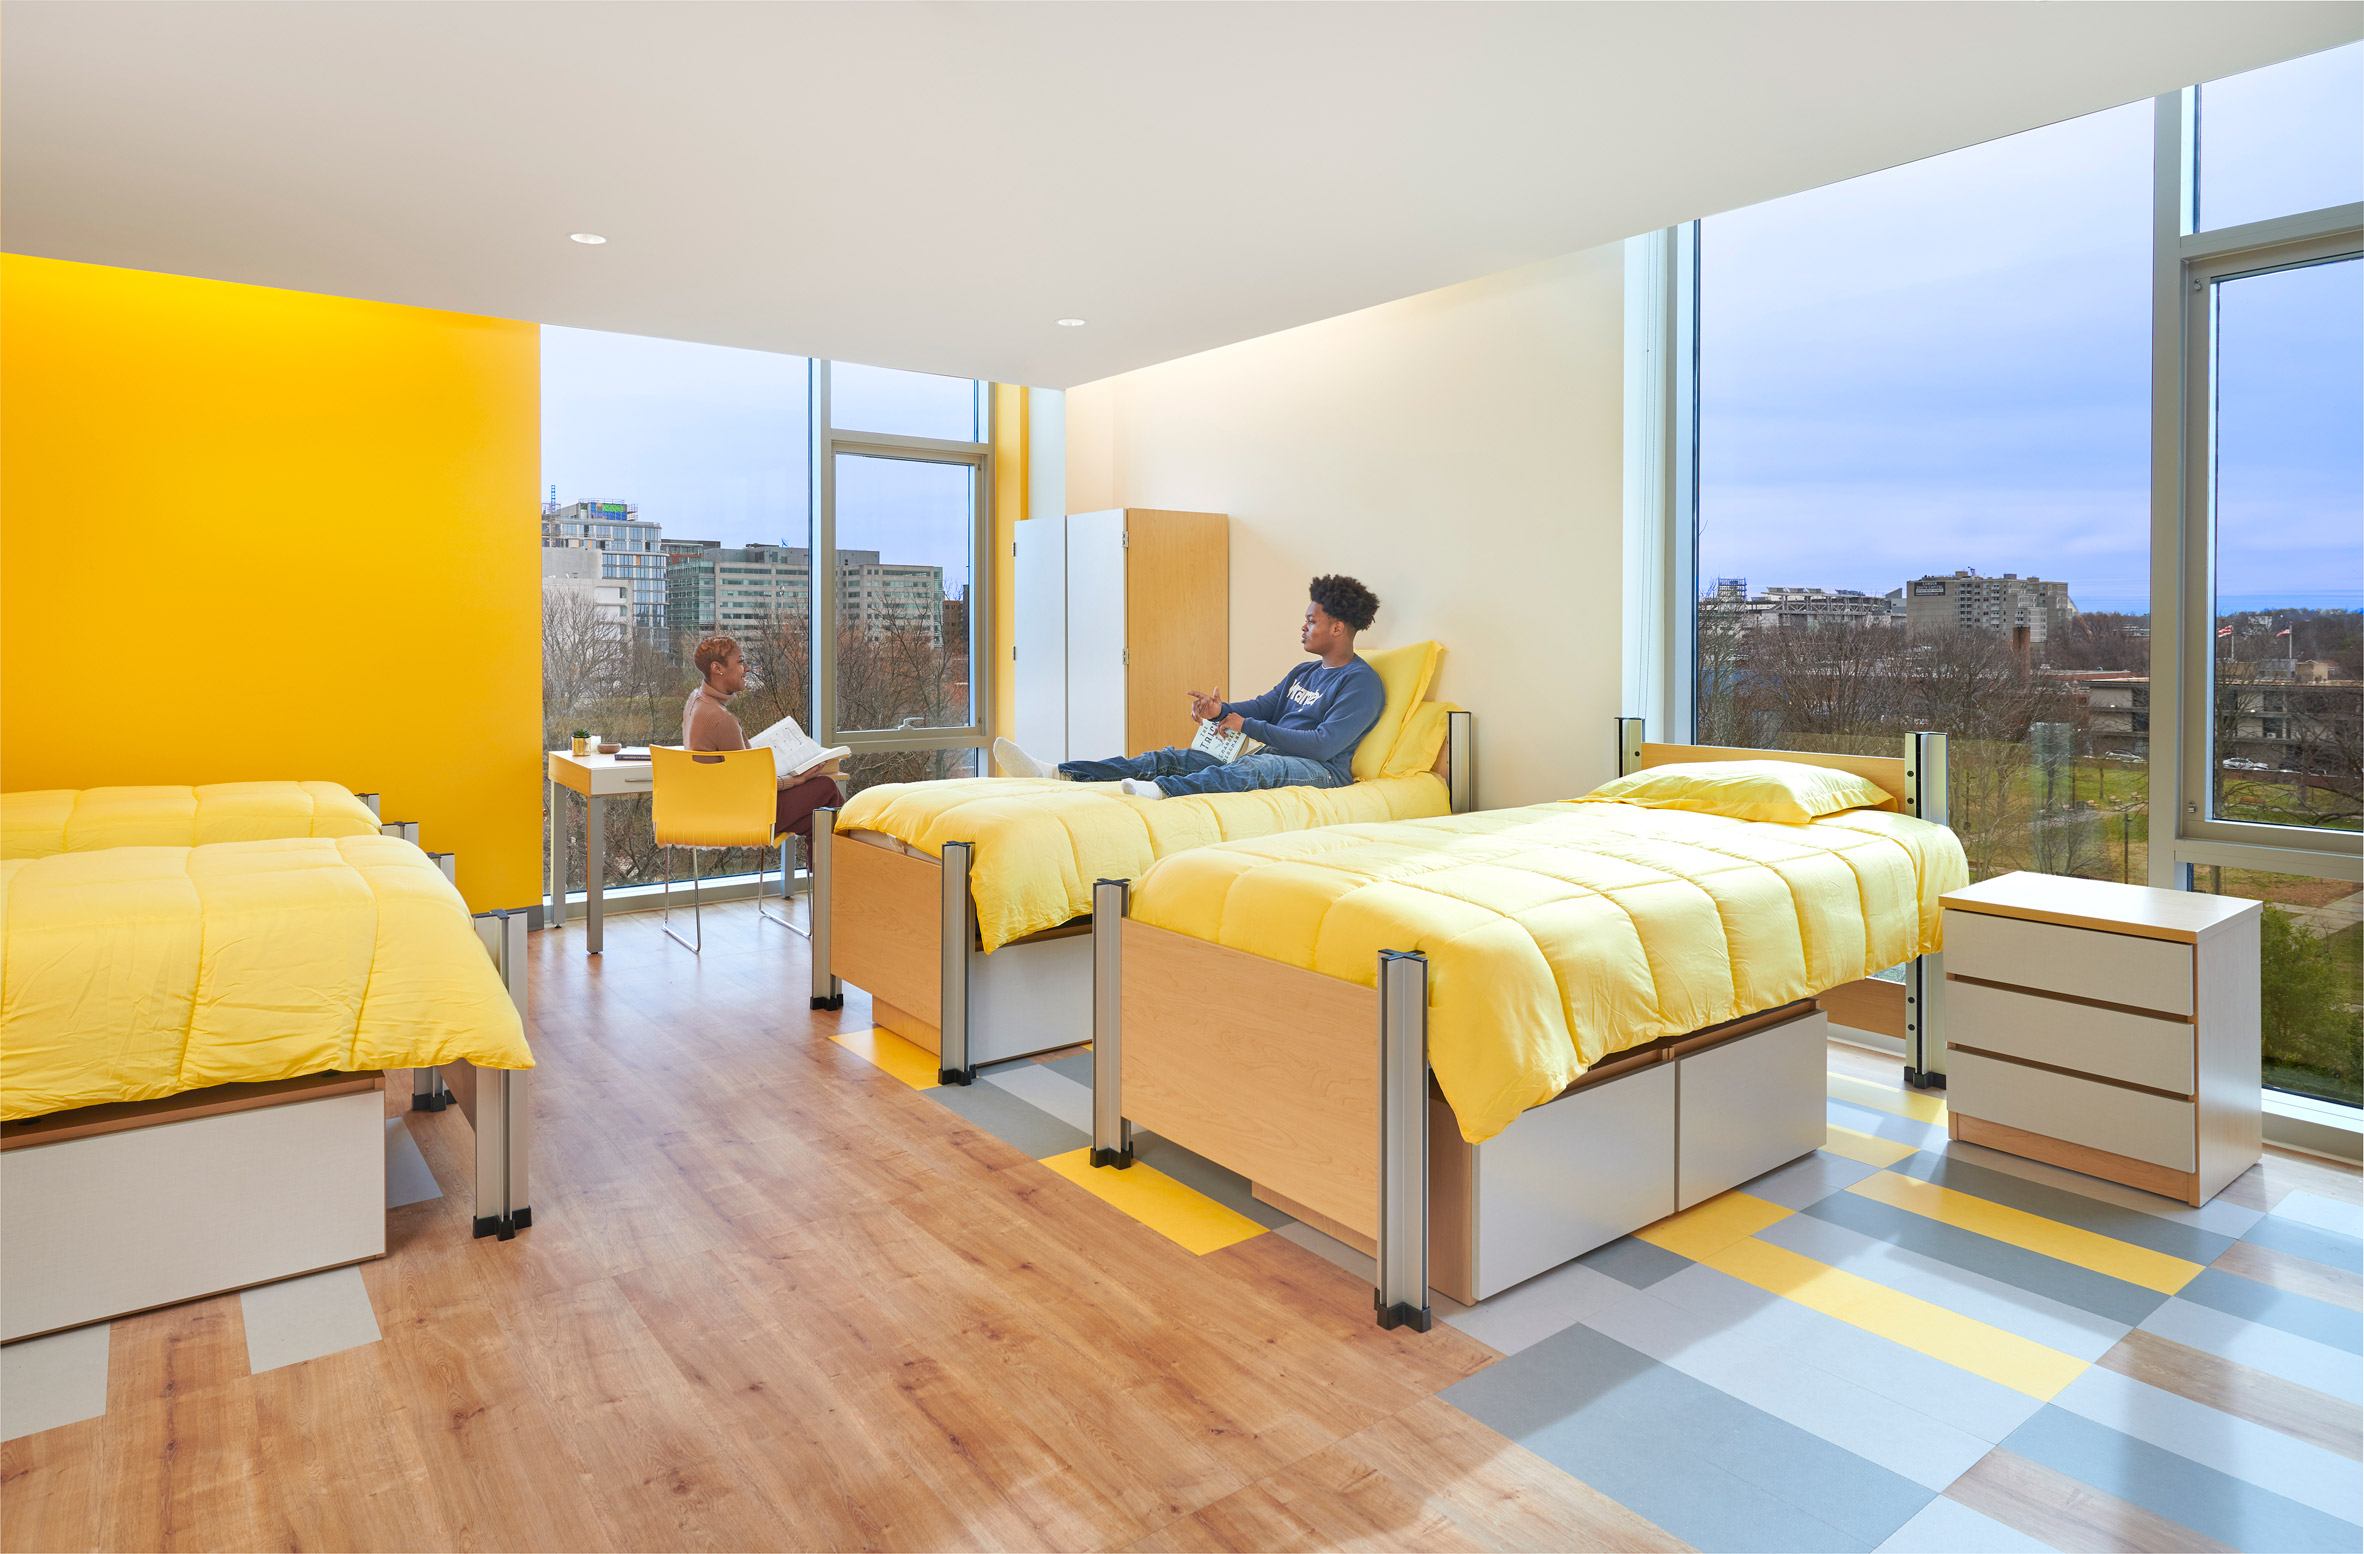 A shared apartment